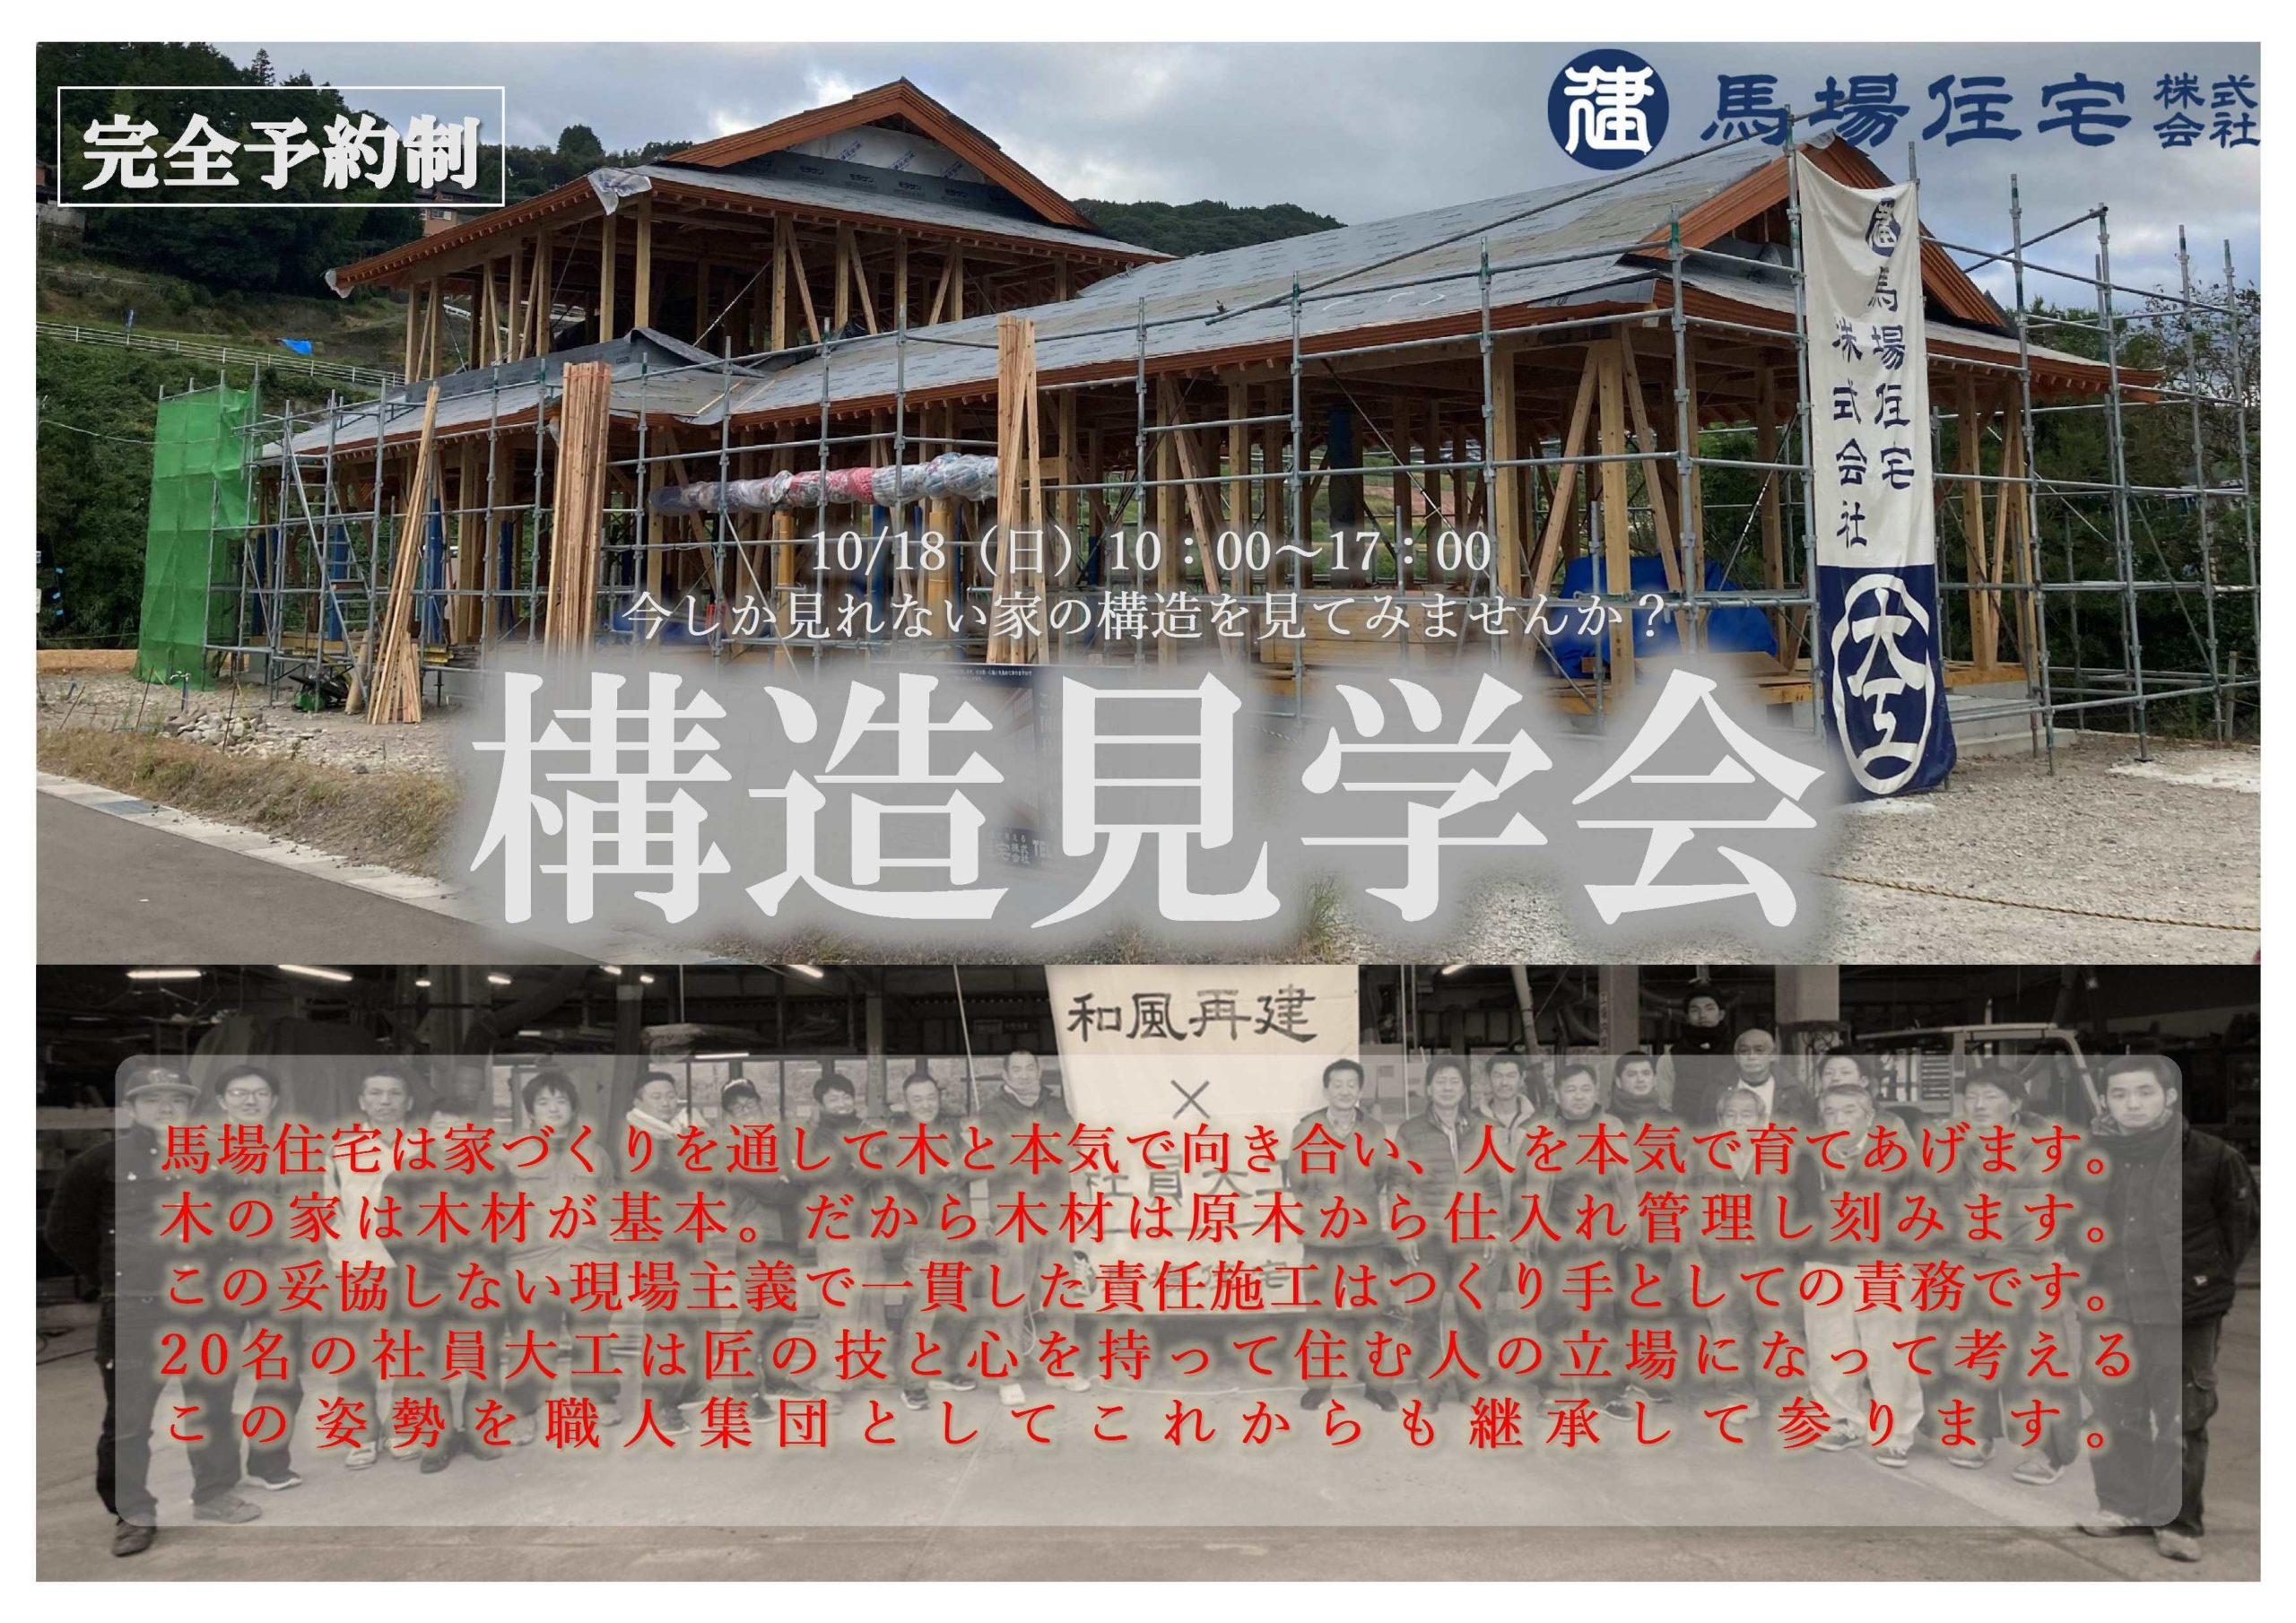 [insta]☆イベント情報☆#家づくりフェスタ10/17~11/1510:00~17:00長崎県内の工務店が期間内に色々なイベントを開催します。#馬場住宅 も企画してますので、是非お越しください。「構造見学会」10/18(日)10:00~17:00【完全予約制・個別案内】今しか見れない家のつくり今回は純和風住宅でとても見応えあります。#構造見学会※場所は予約いただいた方へ直接ご案内します。ー ー ー ー ー ー ー ー ー ー ー ー ー ー ー馬場住宅株式会社長崎県大村市中里町418-14TEL 0957-54-3324メール info@babajuutaku.com@babajuutaku#babajuutakuホームページ【馬場住宅 】で 検索HPにも施工例あります。私たち#馬場住宅 は長崎県大村市の#工務店 です。施工エリアは#長崎県 内全域です。#新築 #注文住宅#リノベーション #リフォーム最近では#古民家再生 #二世帯住宅 #平屋の依頼を多く頂いています。馬場住宅が建てる家3つのスタイルで建てています。#和洋折衷#北欧 #南欧 #ナチュラル#現代和風#現し #無骨 #板張り #無垢#純和風#伝統建築 #和室 #床の間 #書院#zeh #長期優良住宅=================馬場住宅の家づくり地場工務店ですが、大工20名は全員社員として在籍する職人集団技術には定評があり木の家専門の大工工務店として35年の歴史があります。性能と自然素材で安心安全と信頼の住まいをつくります。資料請求はインスタ又はHP内の「お問合せ」からどうぞ@babajuutakuホームページは【馬場住宅 】で 検索